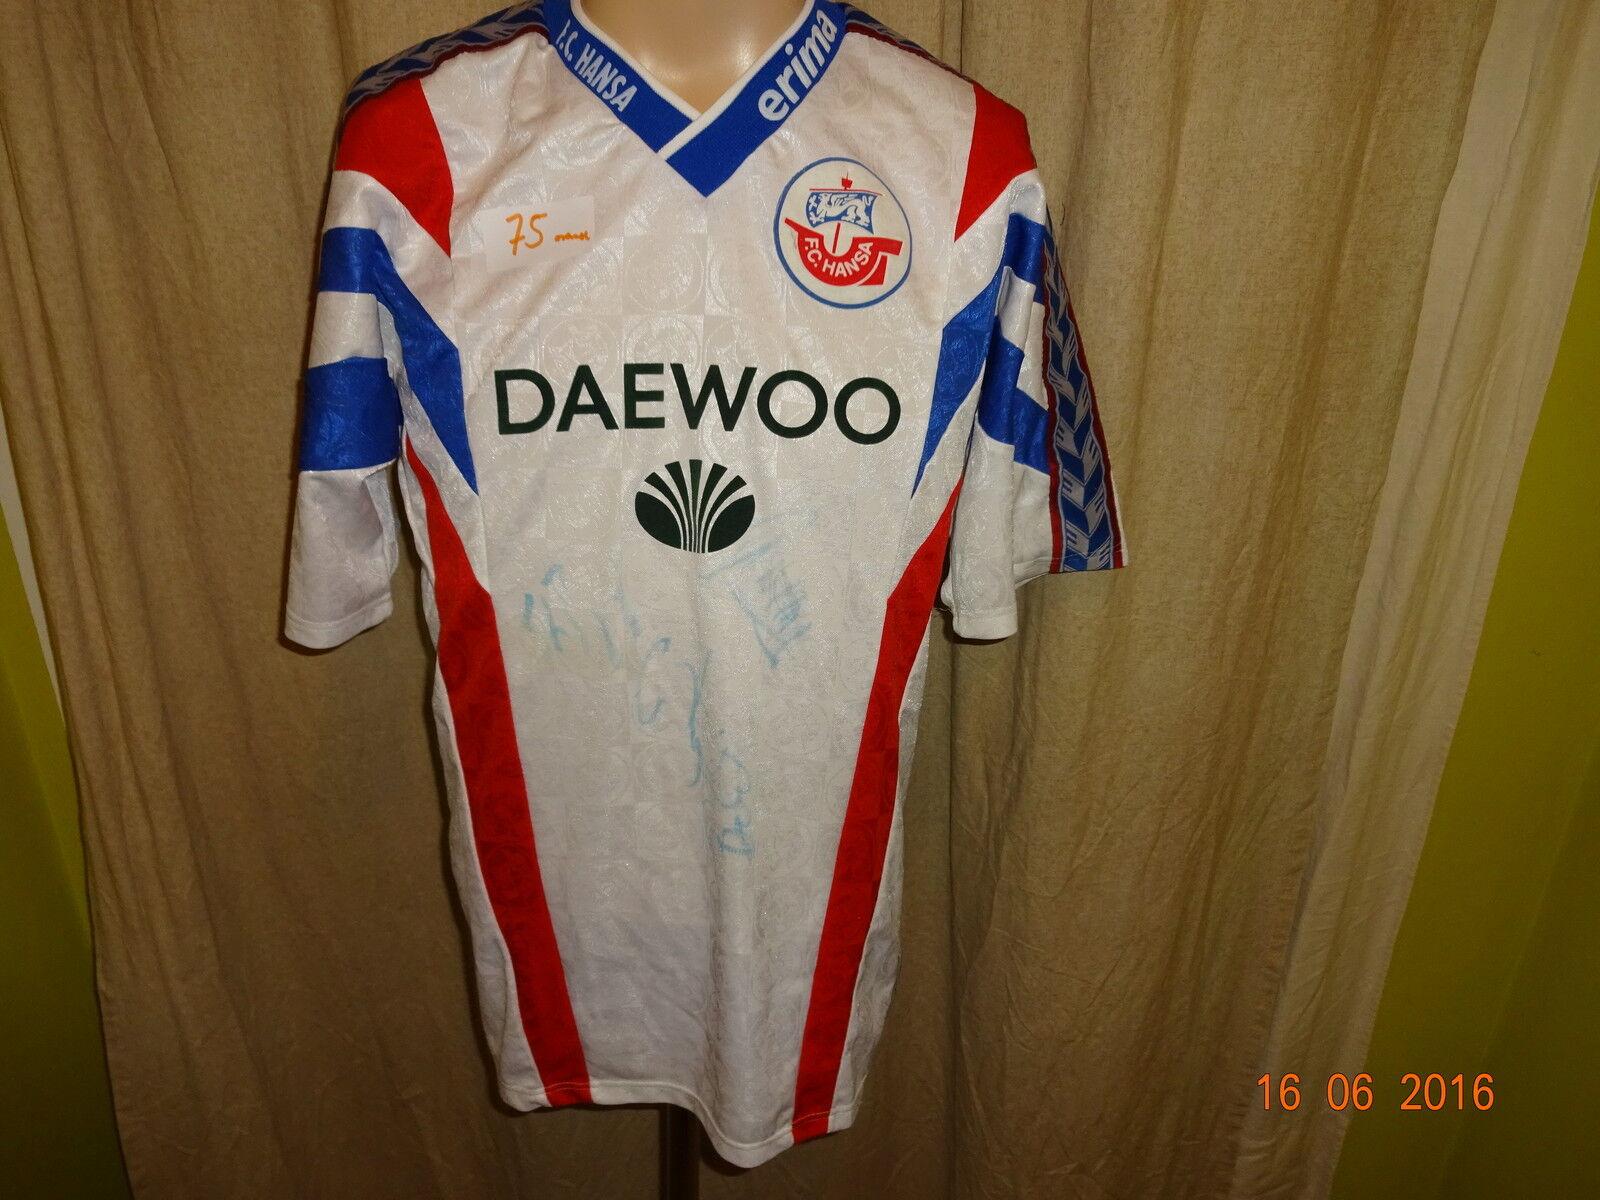 FC Hansa Hansa Hansa Rostock Original erima Heim Trikot 1996 97  DAEWOO  + Handsigniert Gr.M 8cf749